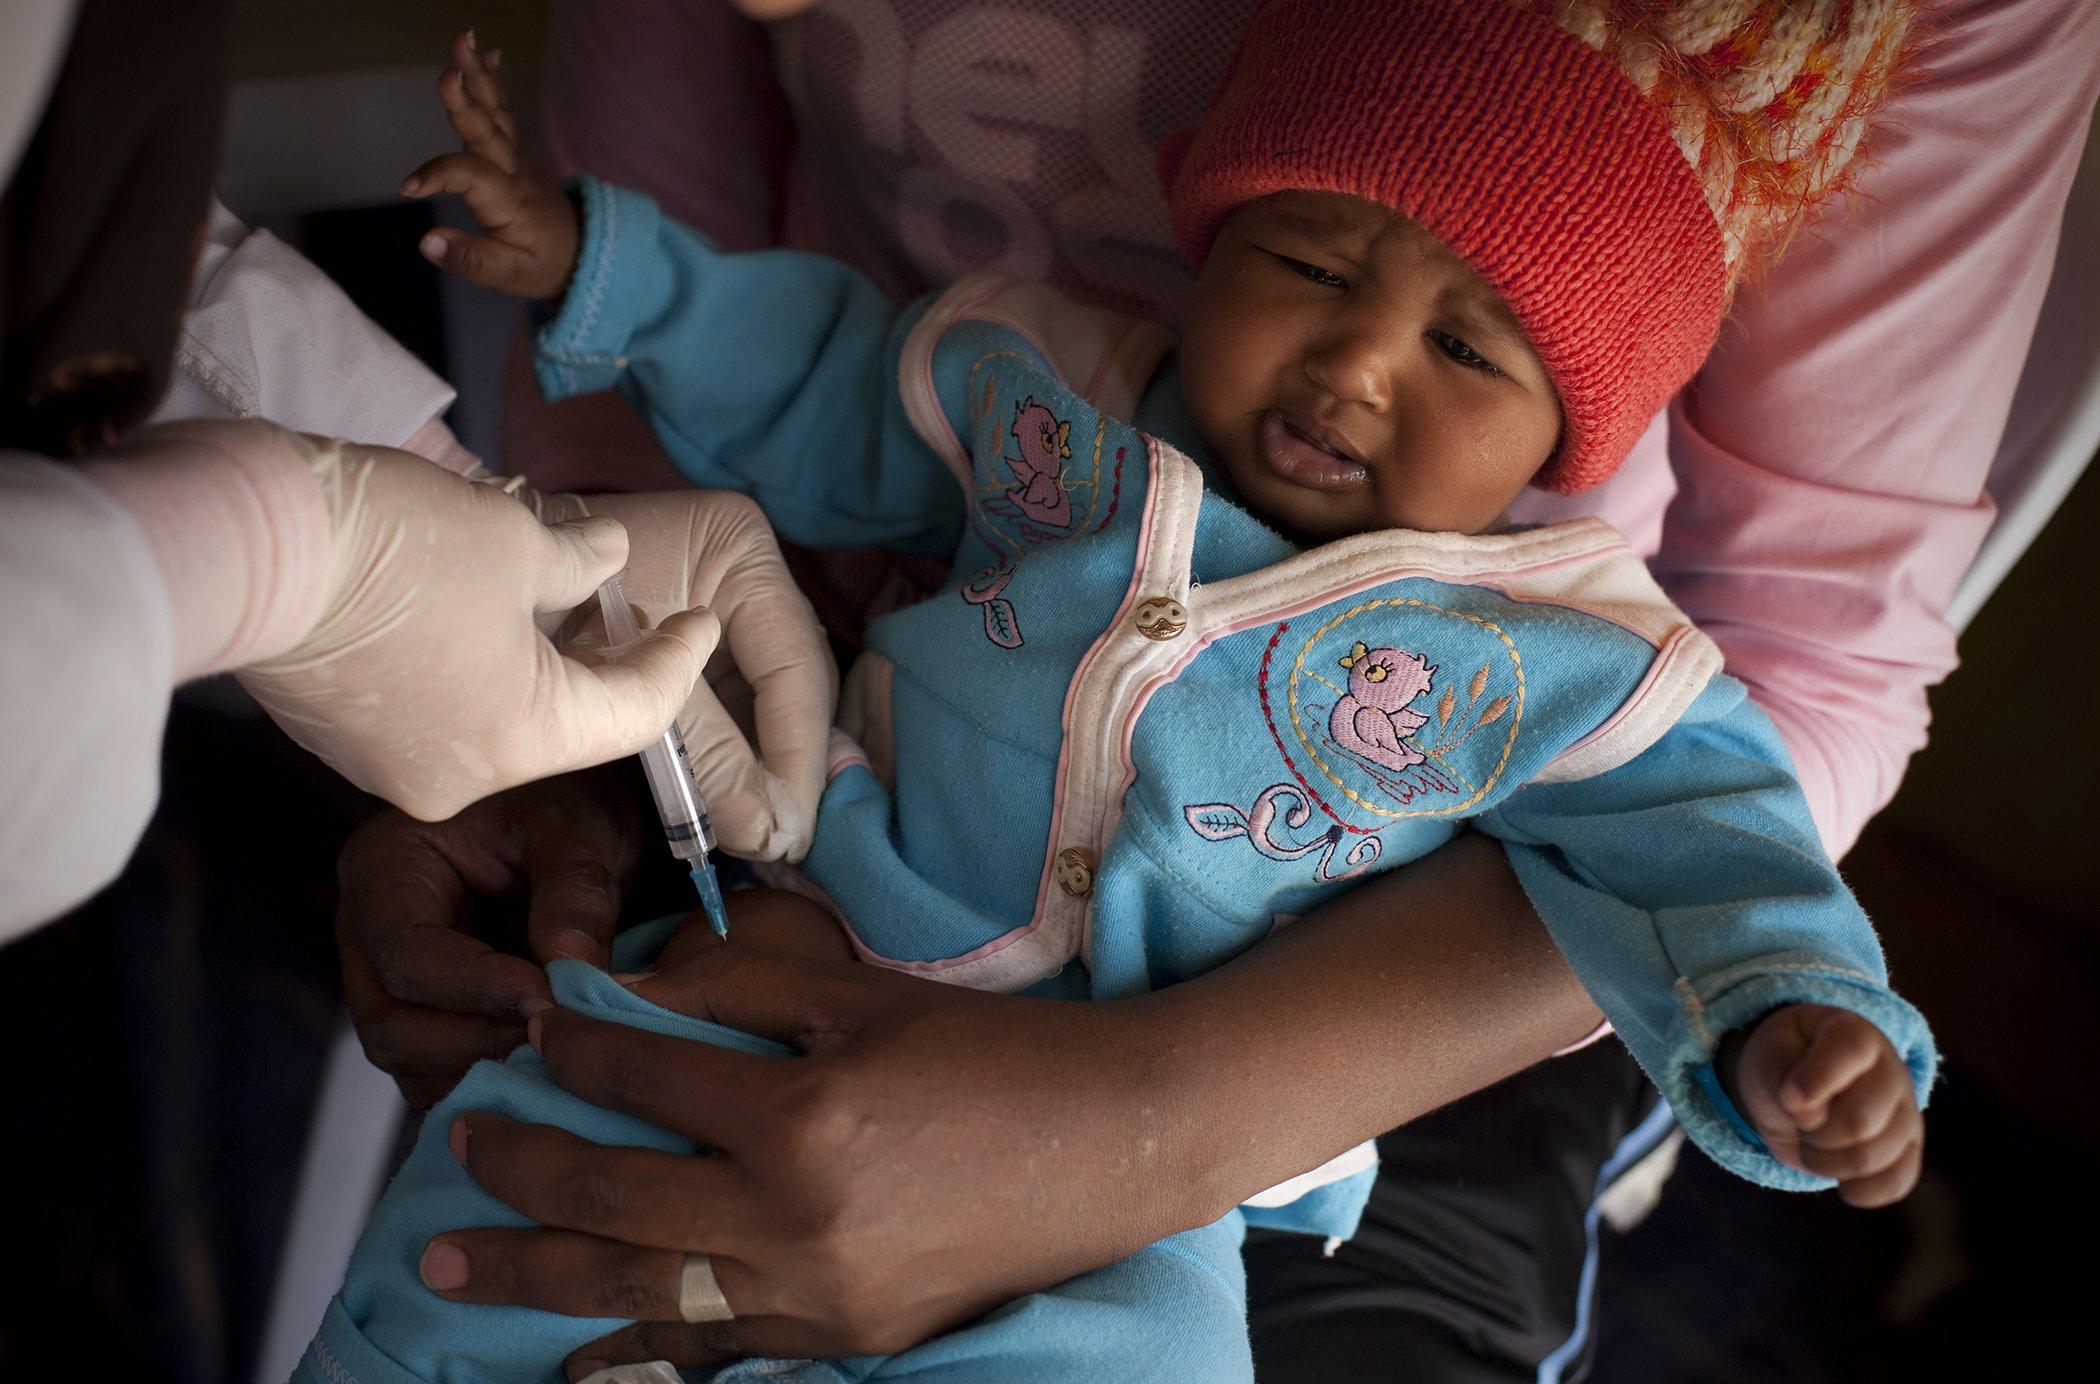 UNICEF_Vaccinations-Around-The-World_004.jpg